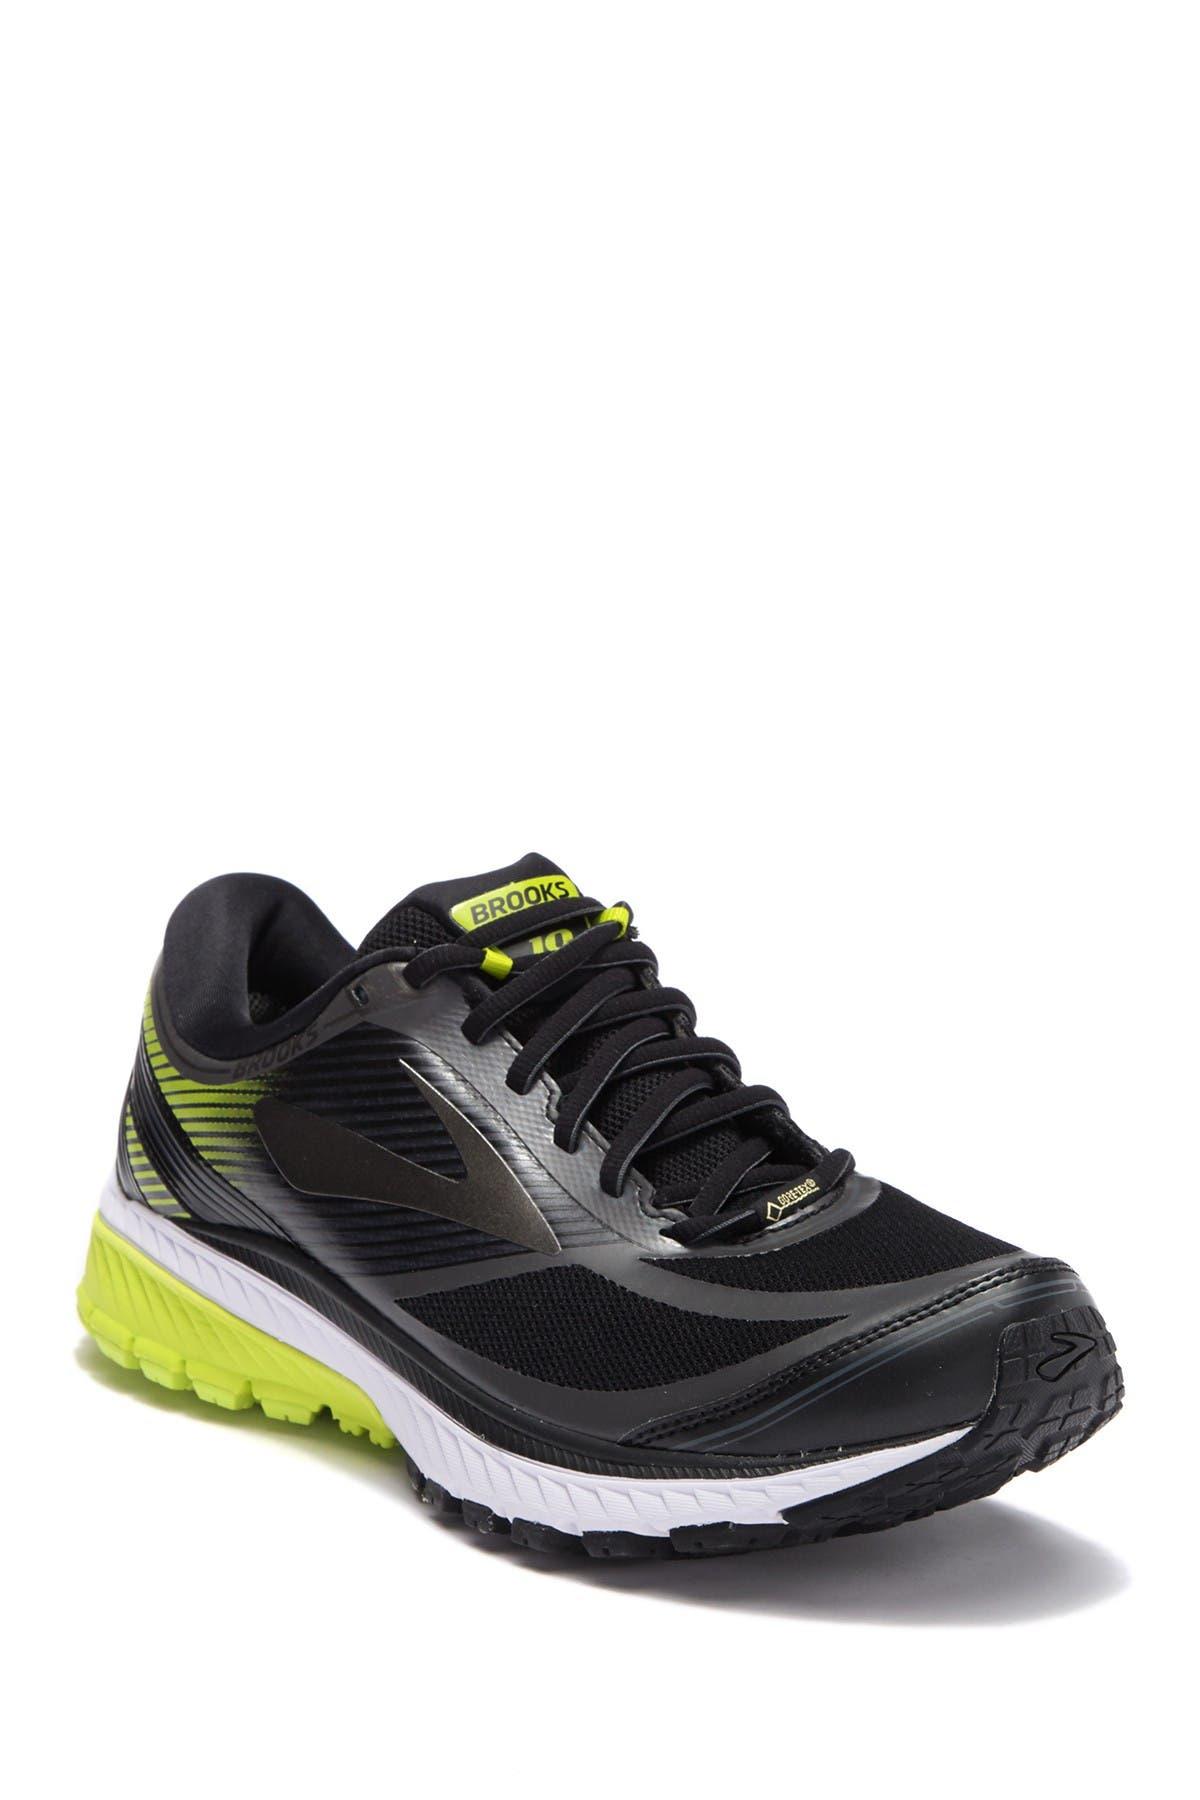 Brooks | Ghost 10 GTX Running Sneaker